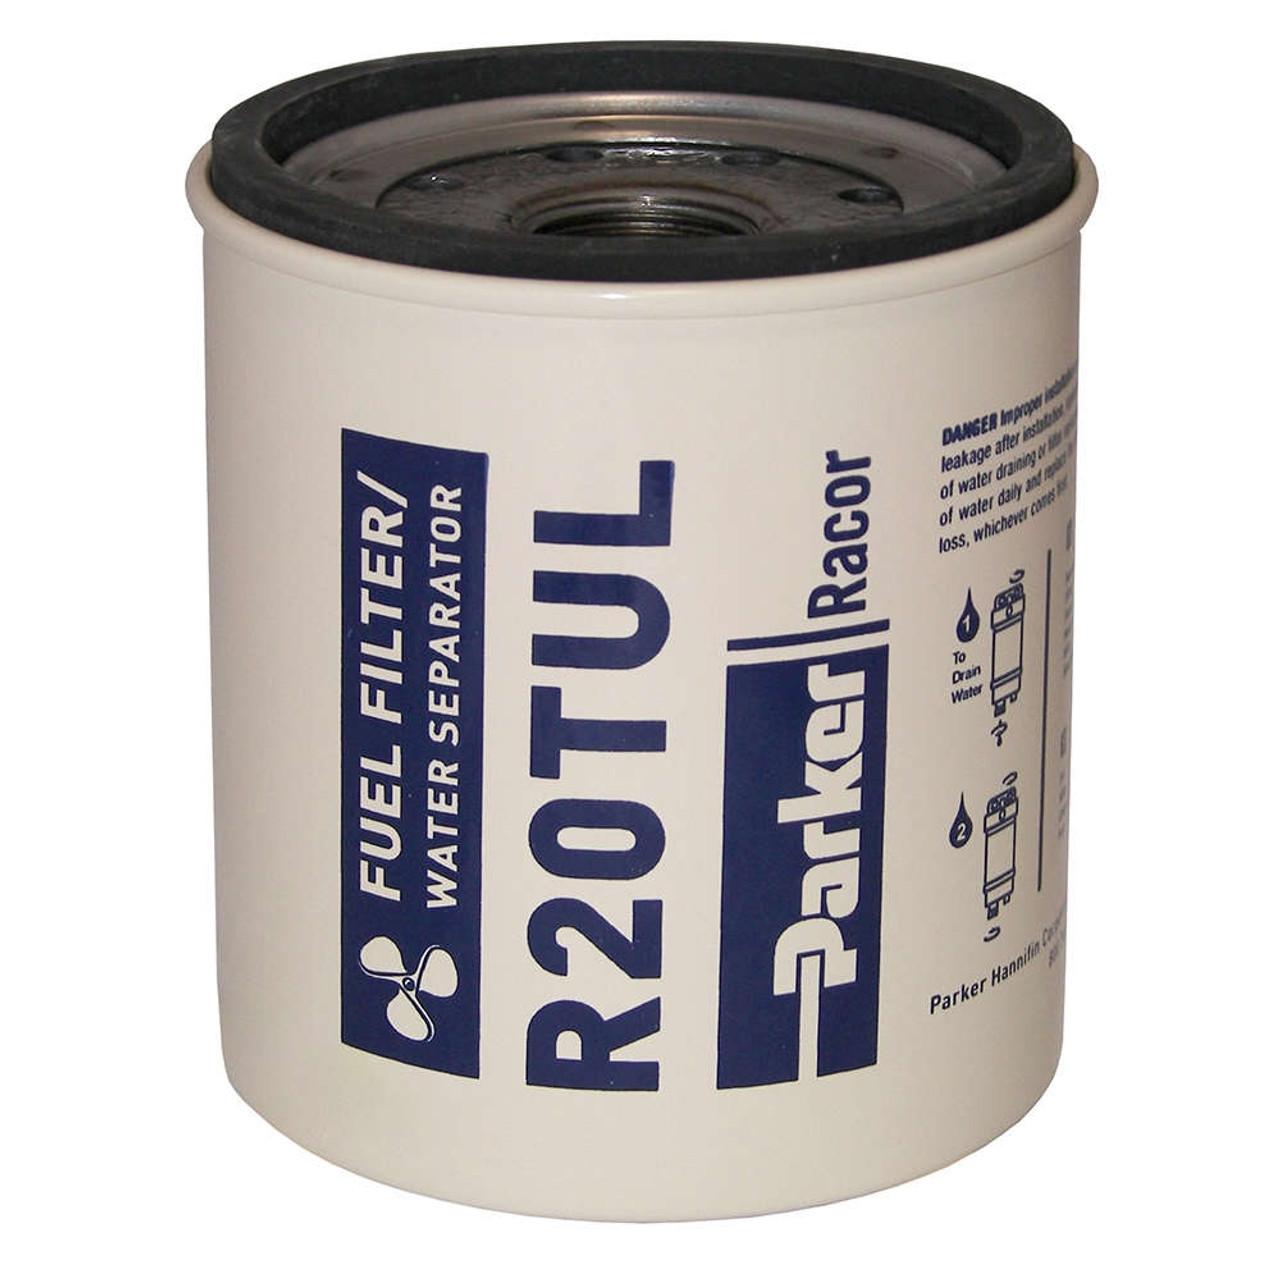 Racor 320 Engine Spin On Series Fuel Filter Water Separator R20tul Diesel 12